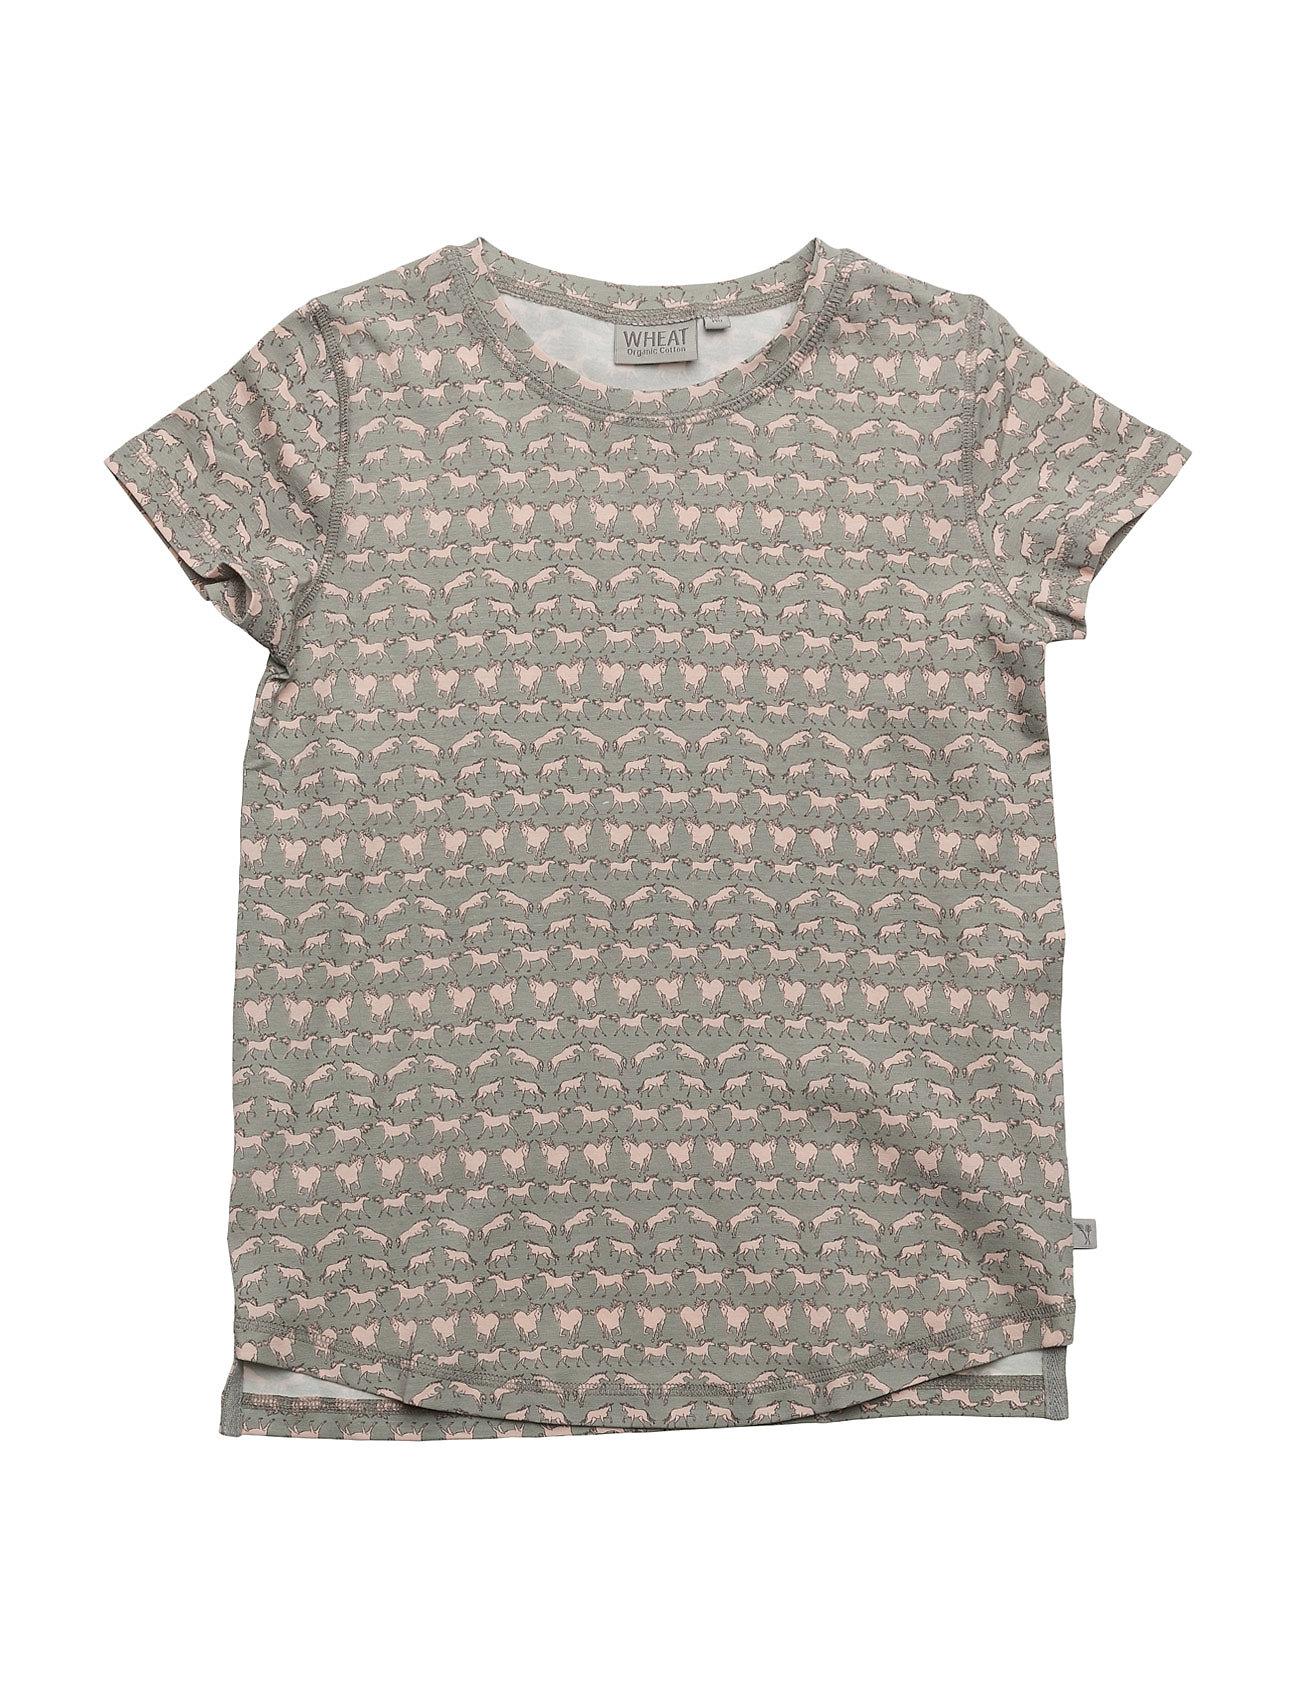 T-Shirt Nicola Ss Wheat Kortærmede t-shirts til Børn i Lysegrå